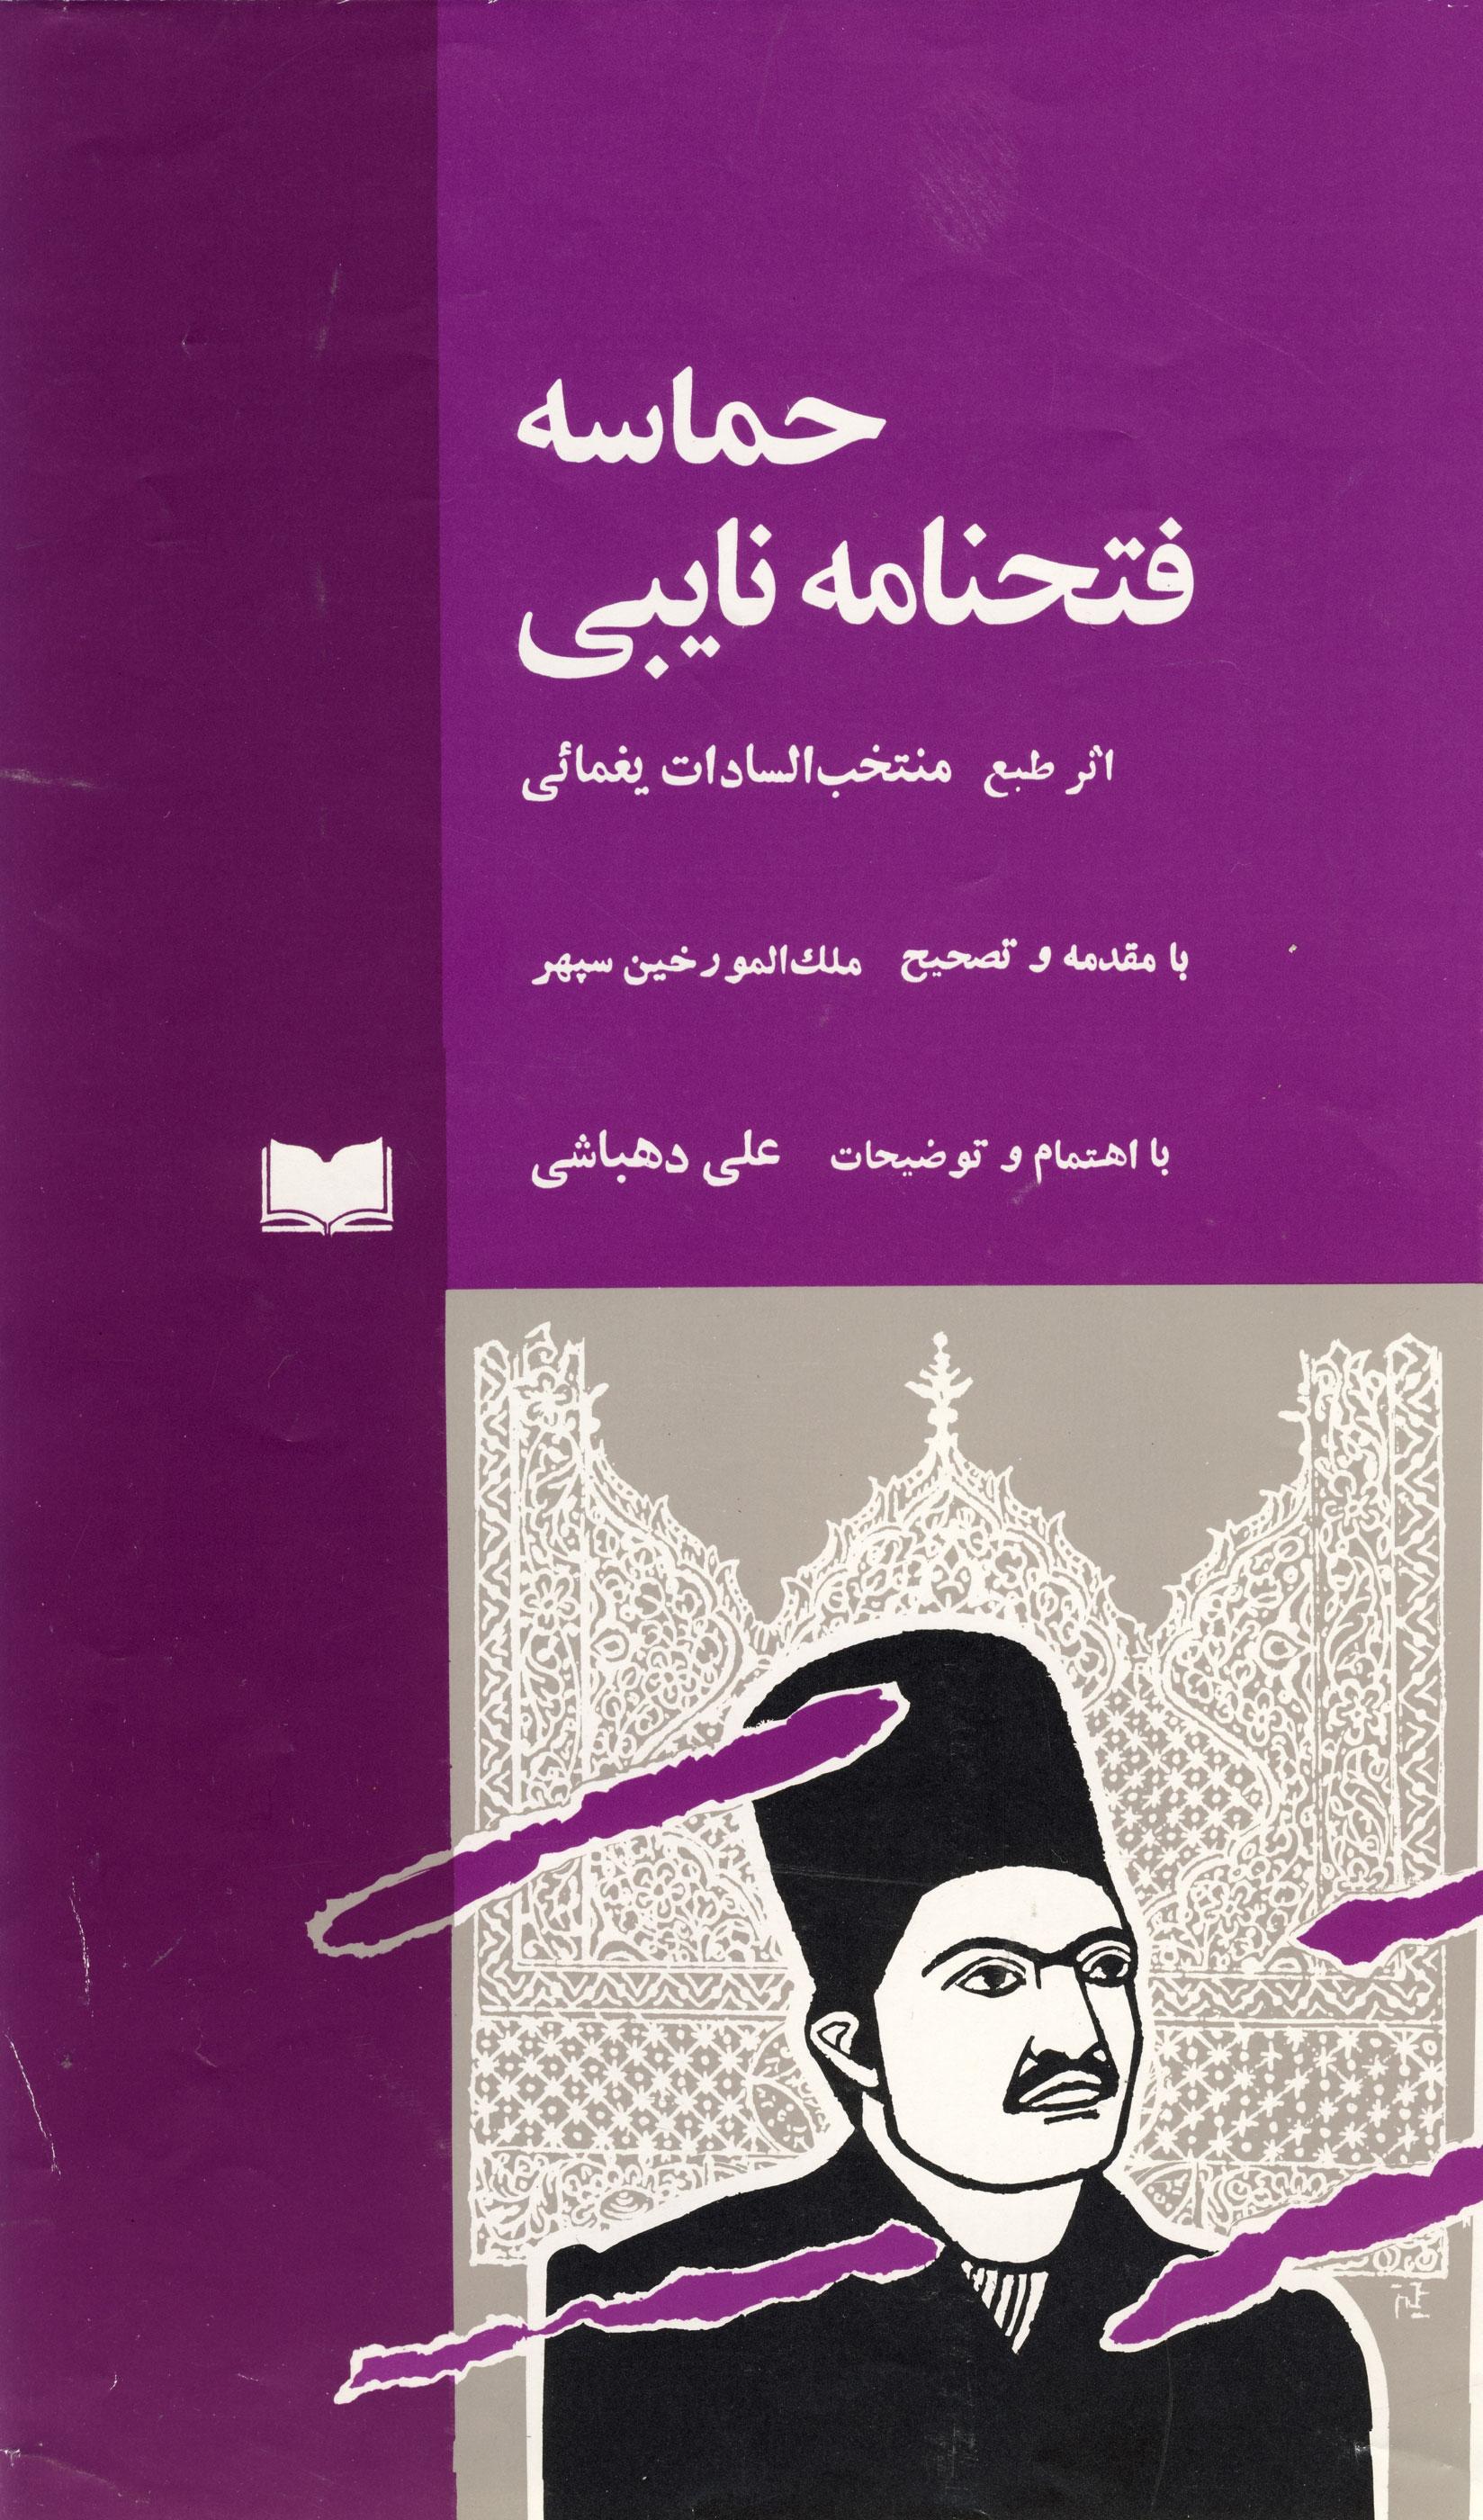 Nayebi